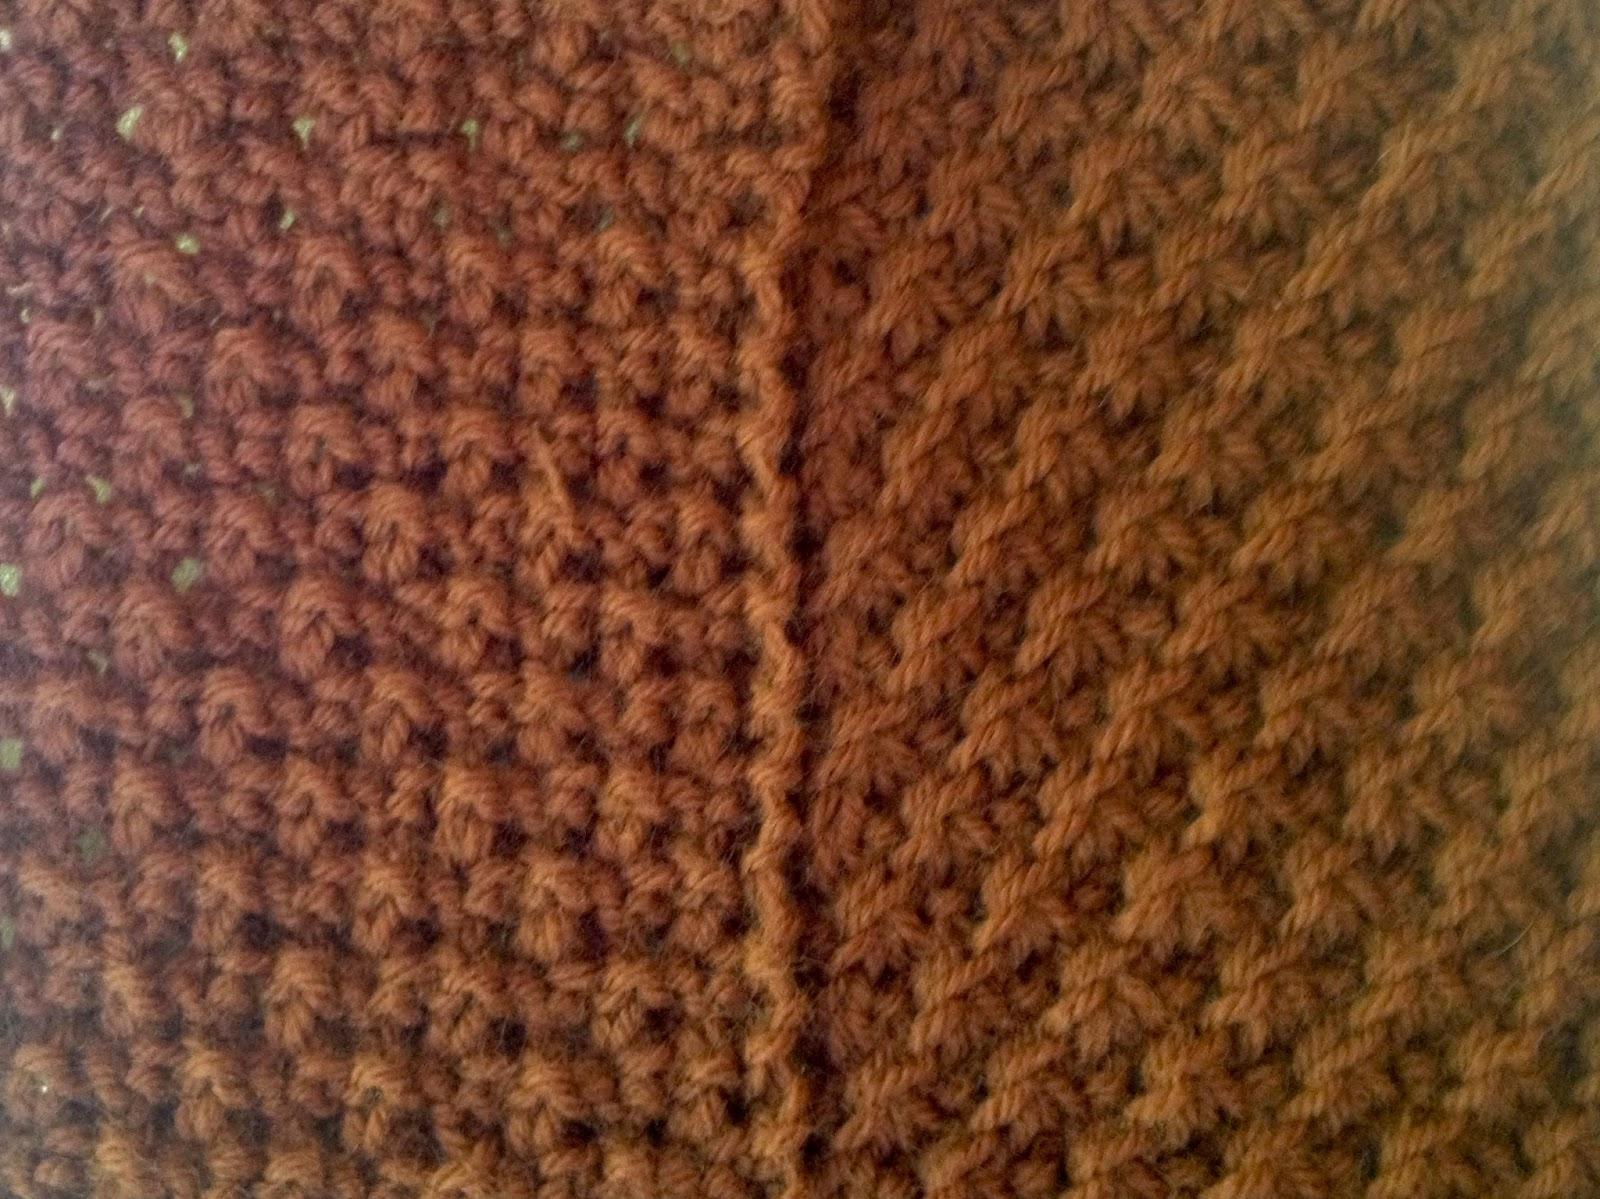 Pattons Daisy Stitch Scarf A Time To Knit